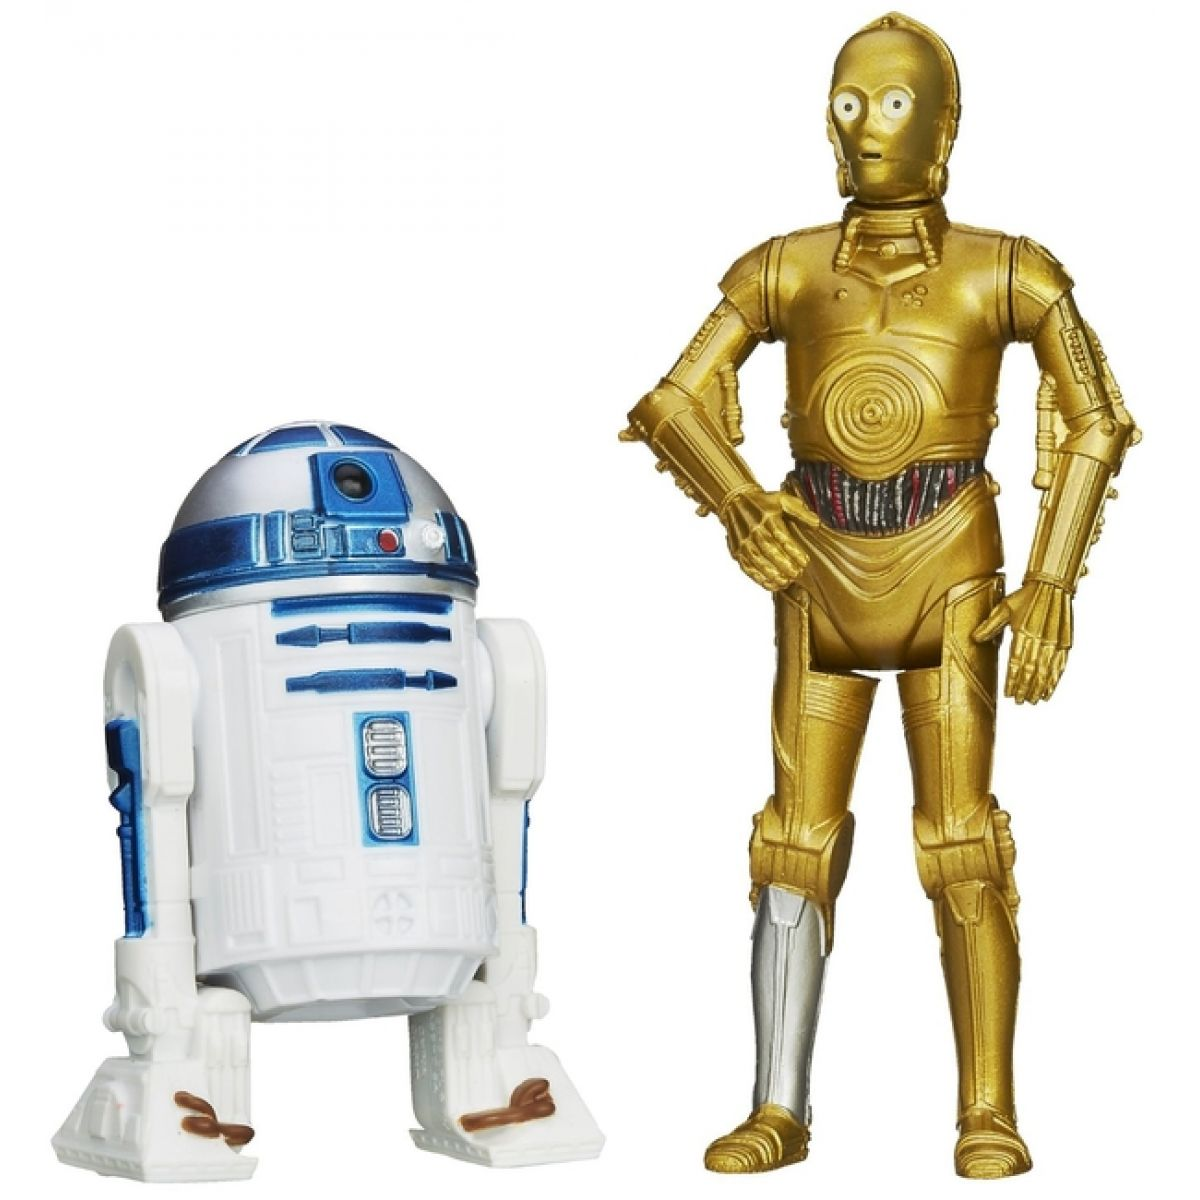 Hasbro Star Wars Akční figurky 2ks - R2-D2, C3PO